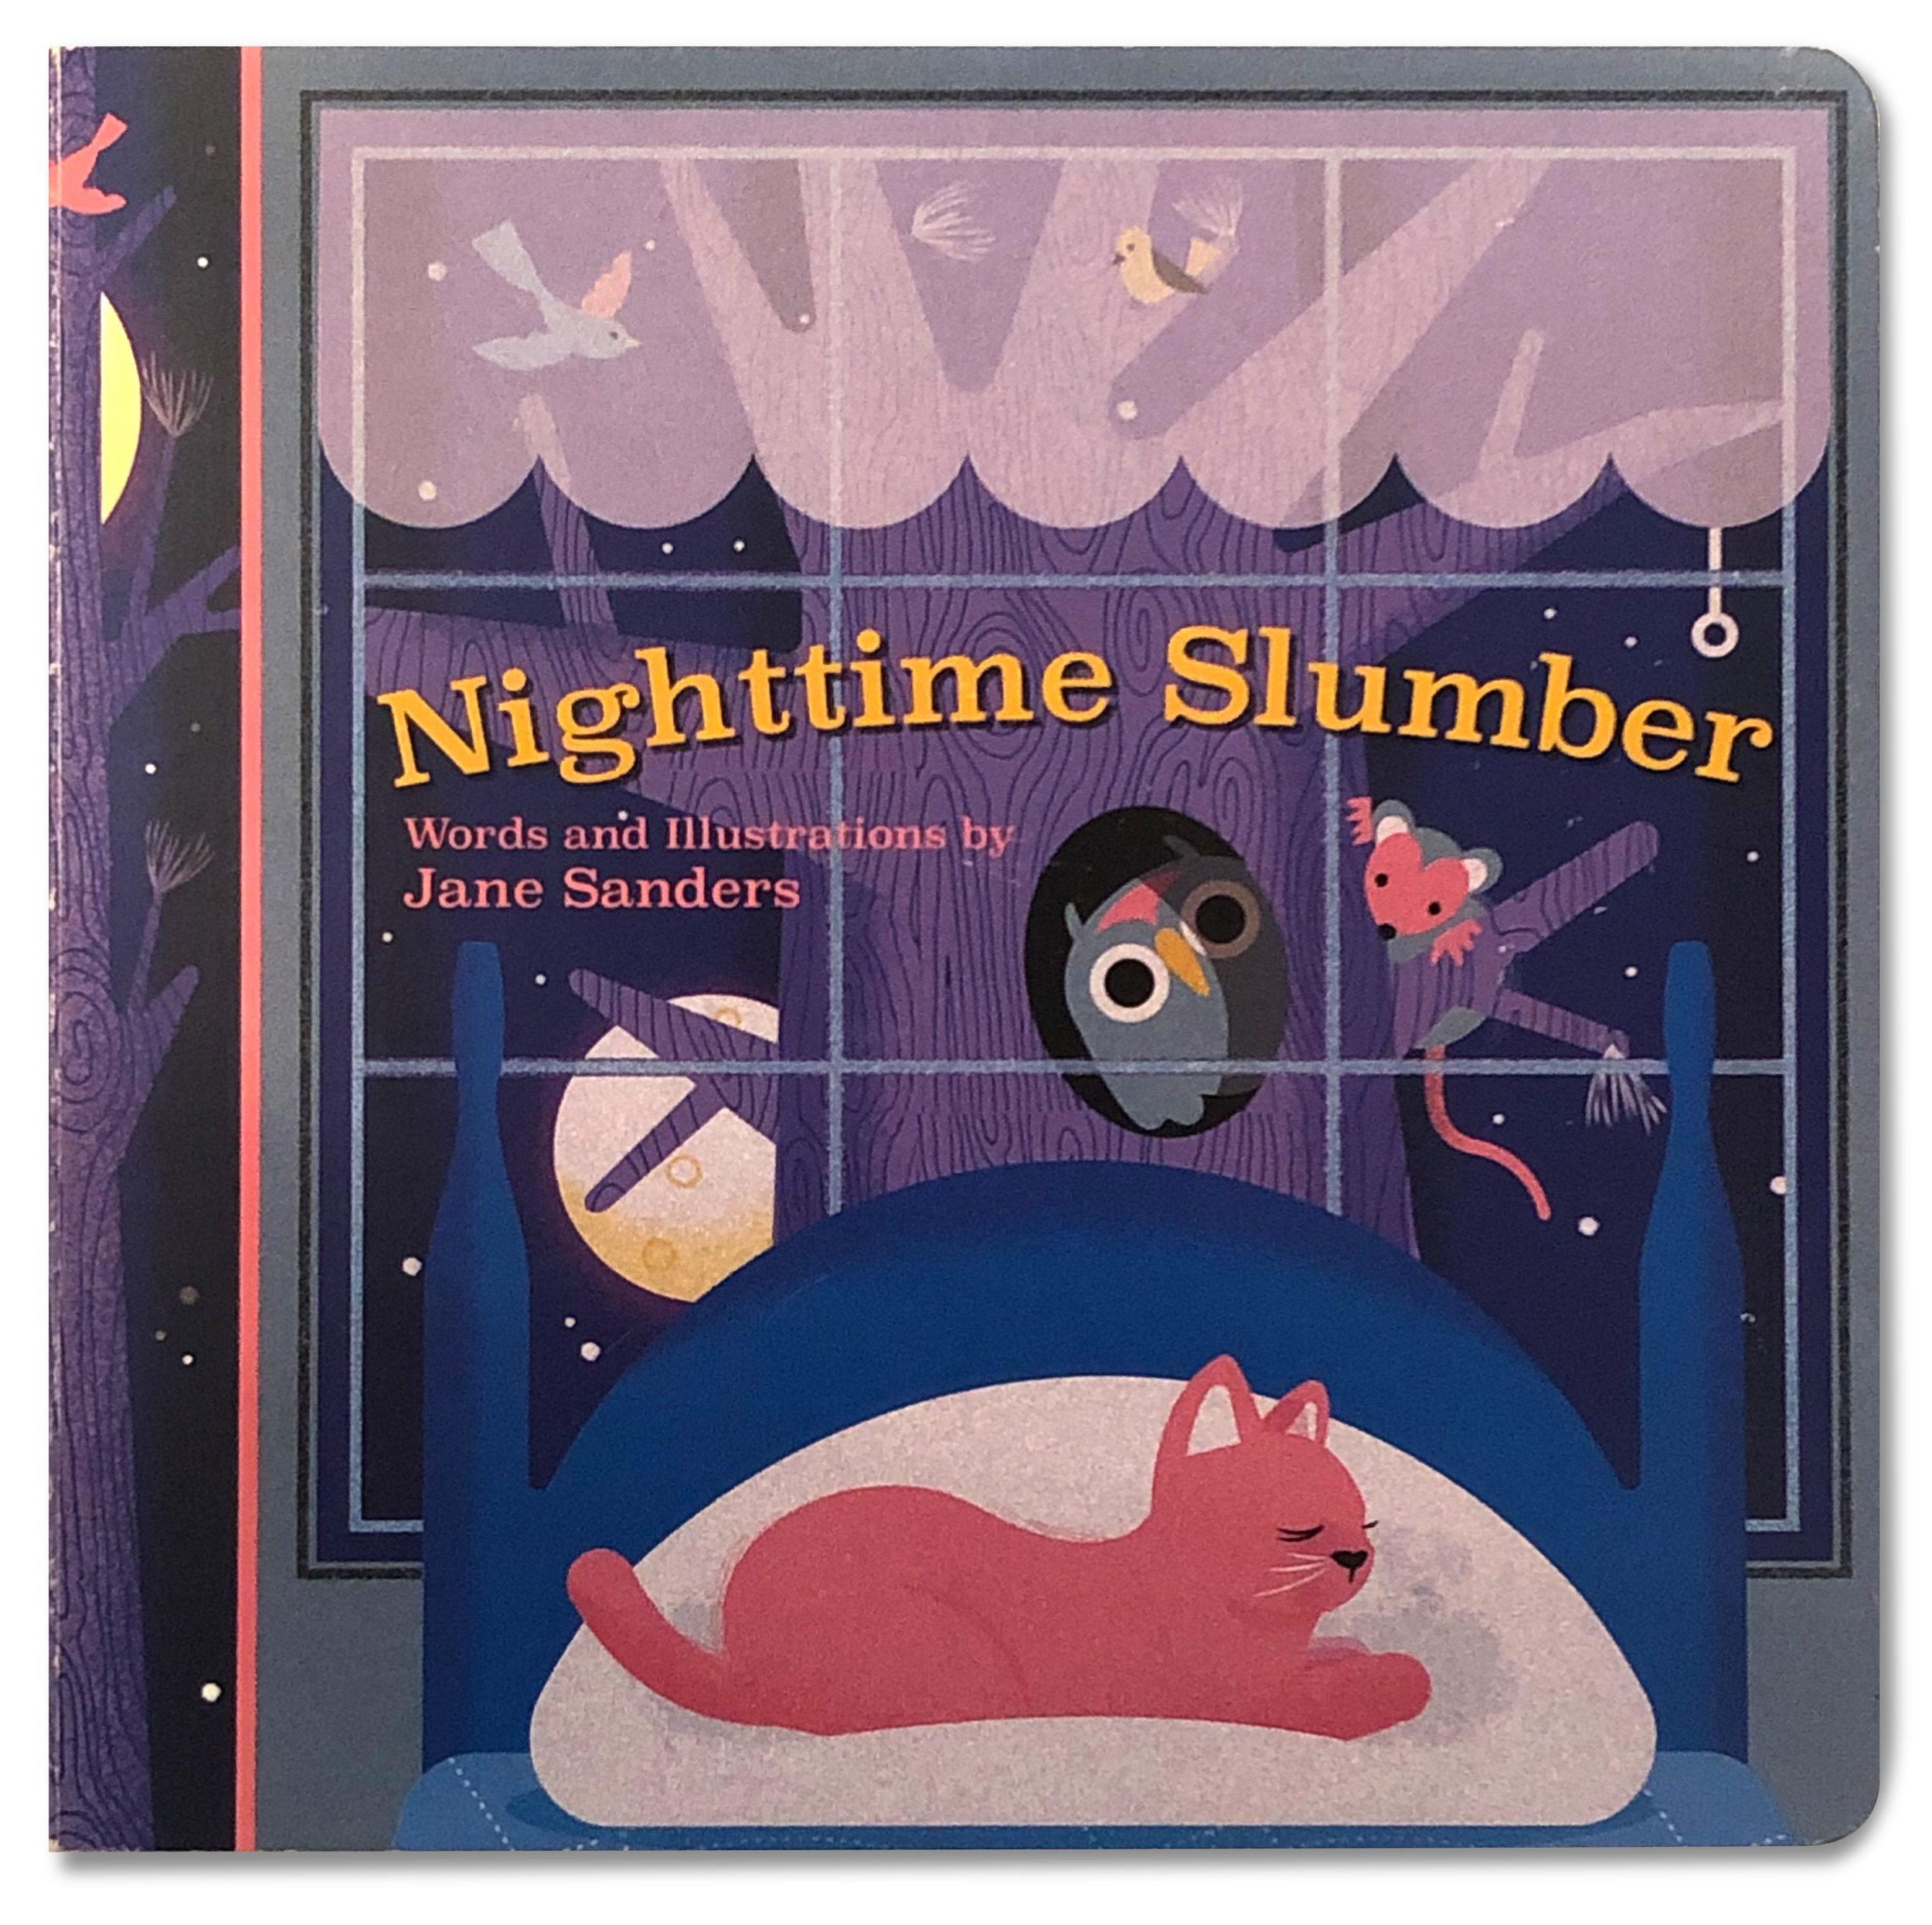 Nighttime Slumber, Gibbs & Smith